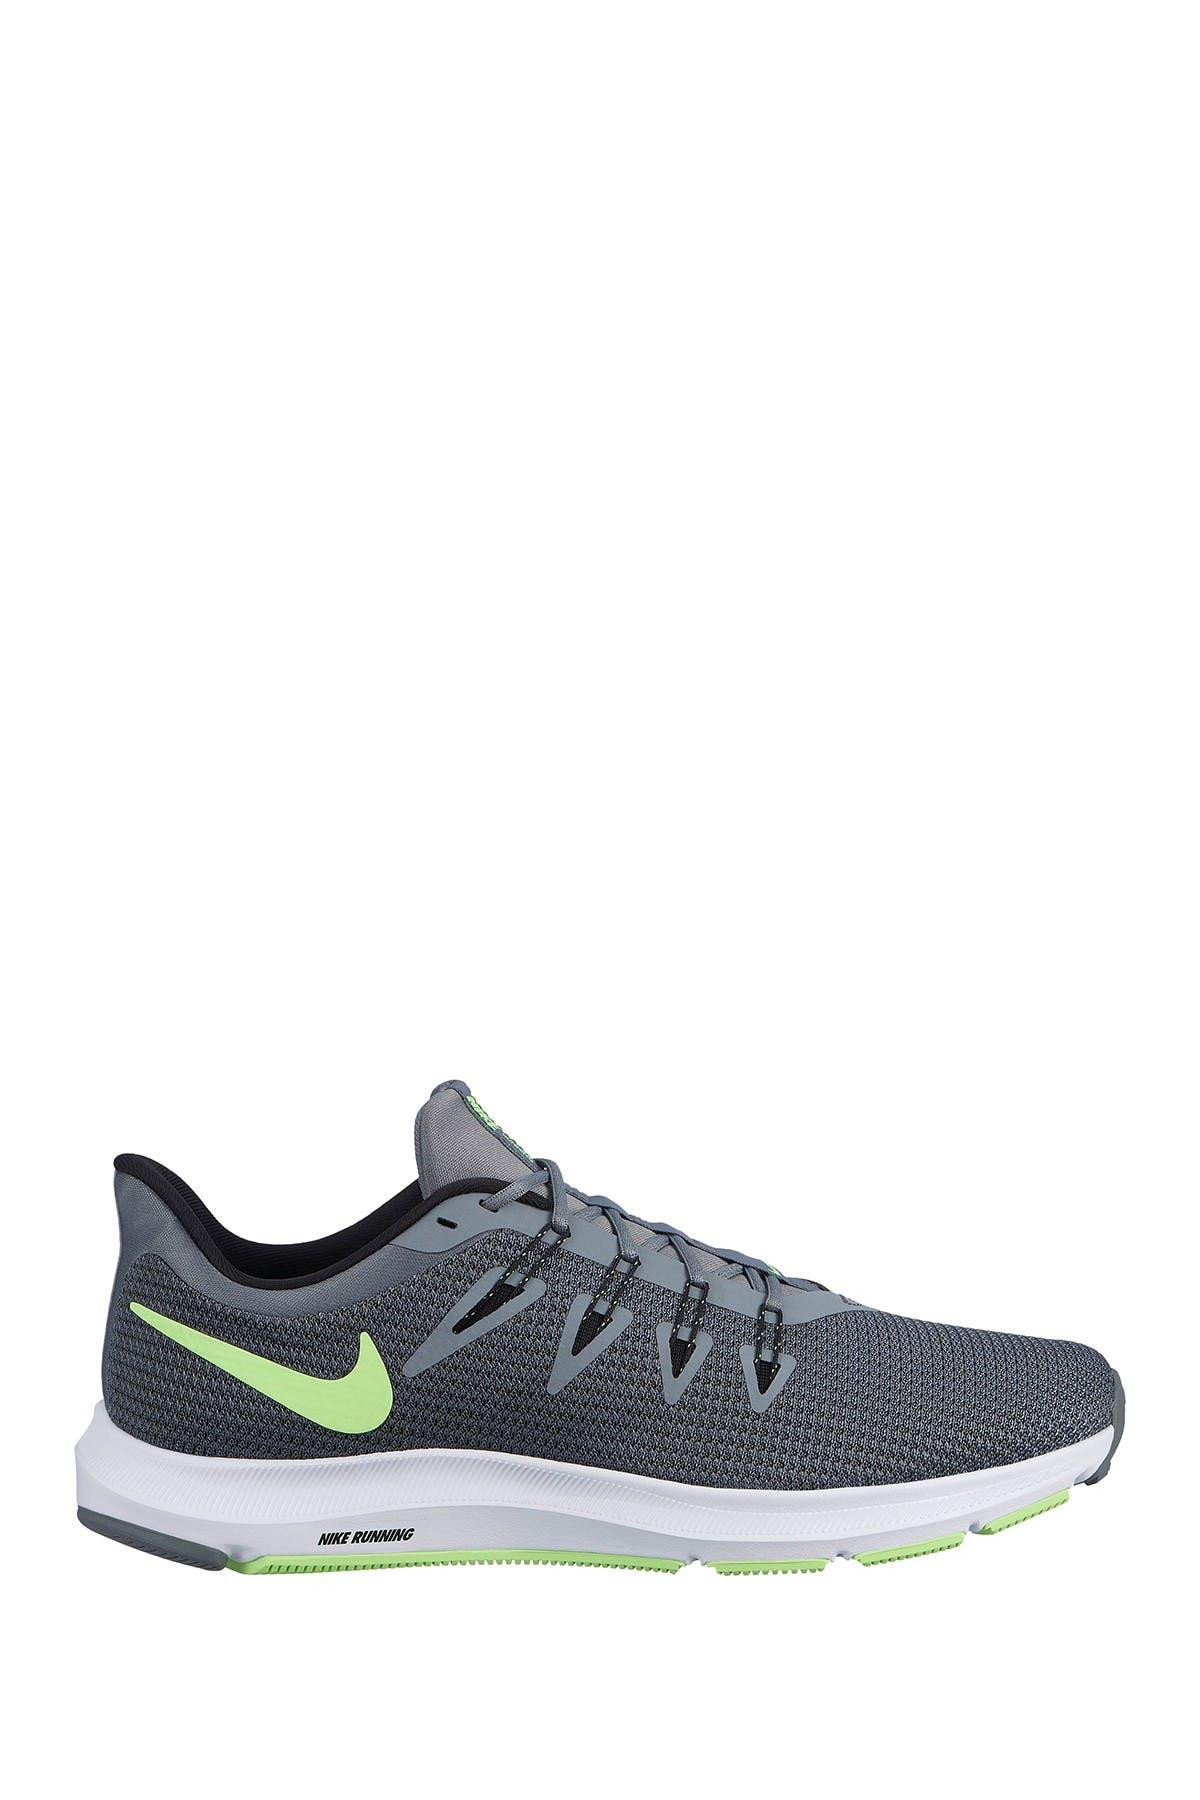 Nike   Quest Running Shoe   Nordstrom Rack